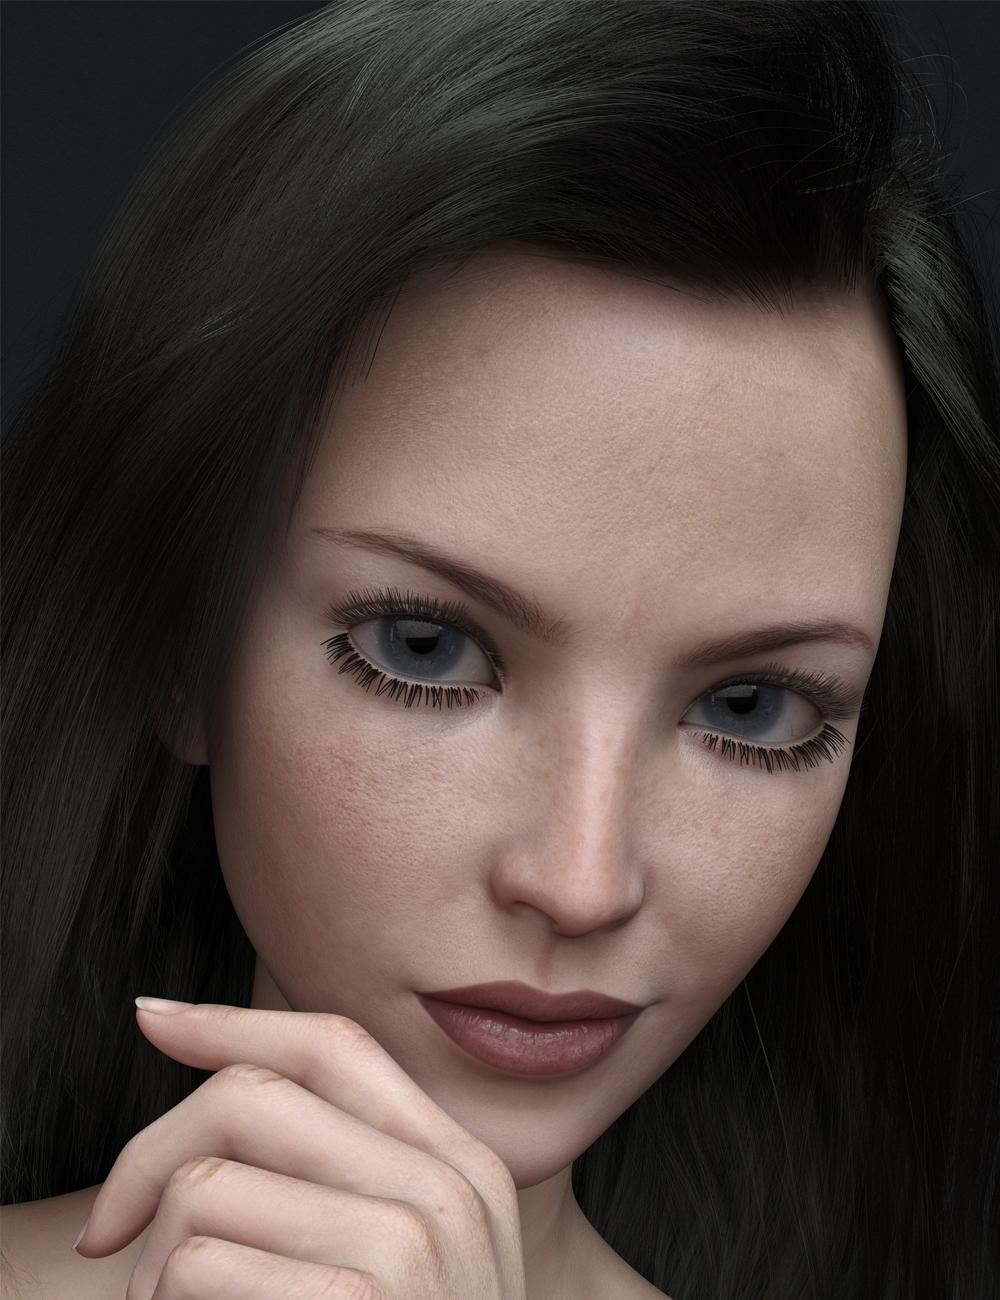 MR Danny for Genesis 8.1 Female by: Marcius, 3D Models by Daz 3D